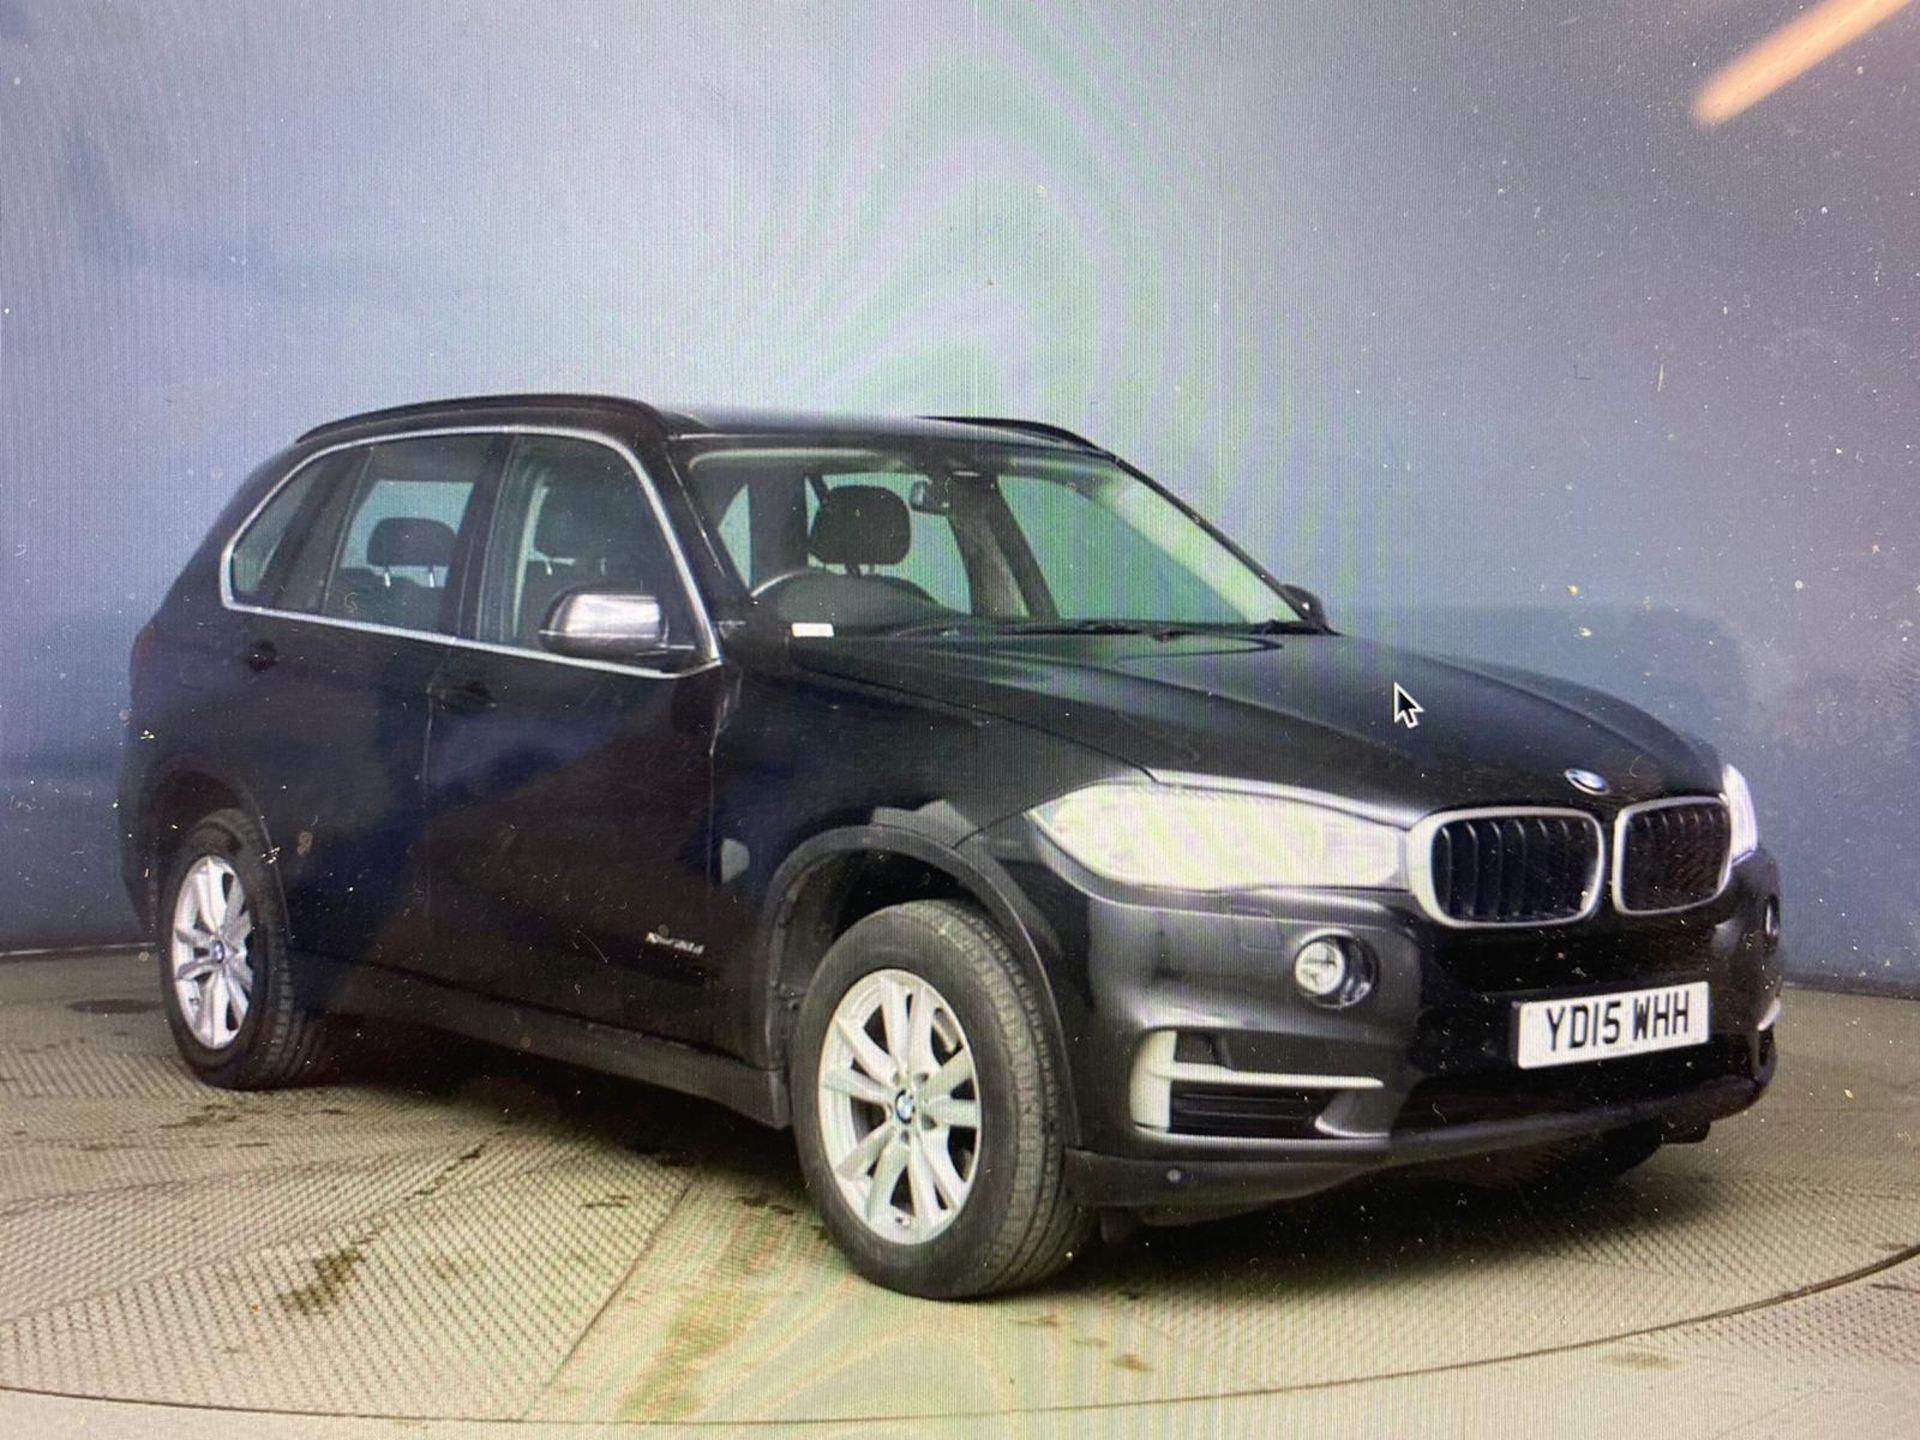 "BMW X5 3.0d xDrive""Auto"" Special Equipment - 15 Reg - 7 Seater -Leather - Sat Nav -Mega Spec- No Vat - Image 3 of 13"